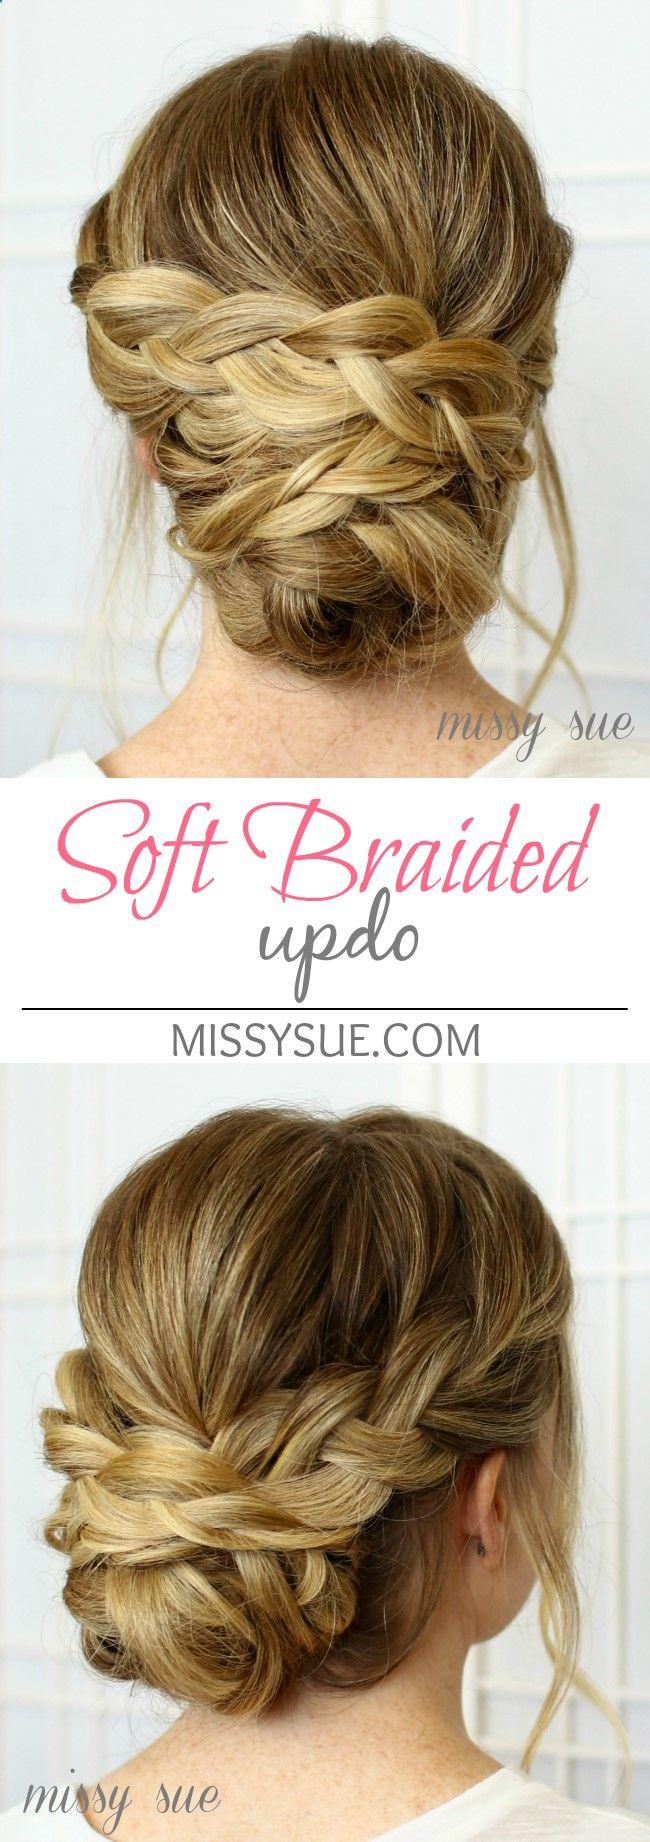 Groovy 1000 Ideas About Braided Updo On Pinterest Braids Braided Short Hairstyles For Black Women Fulllsitofus